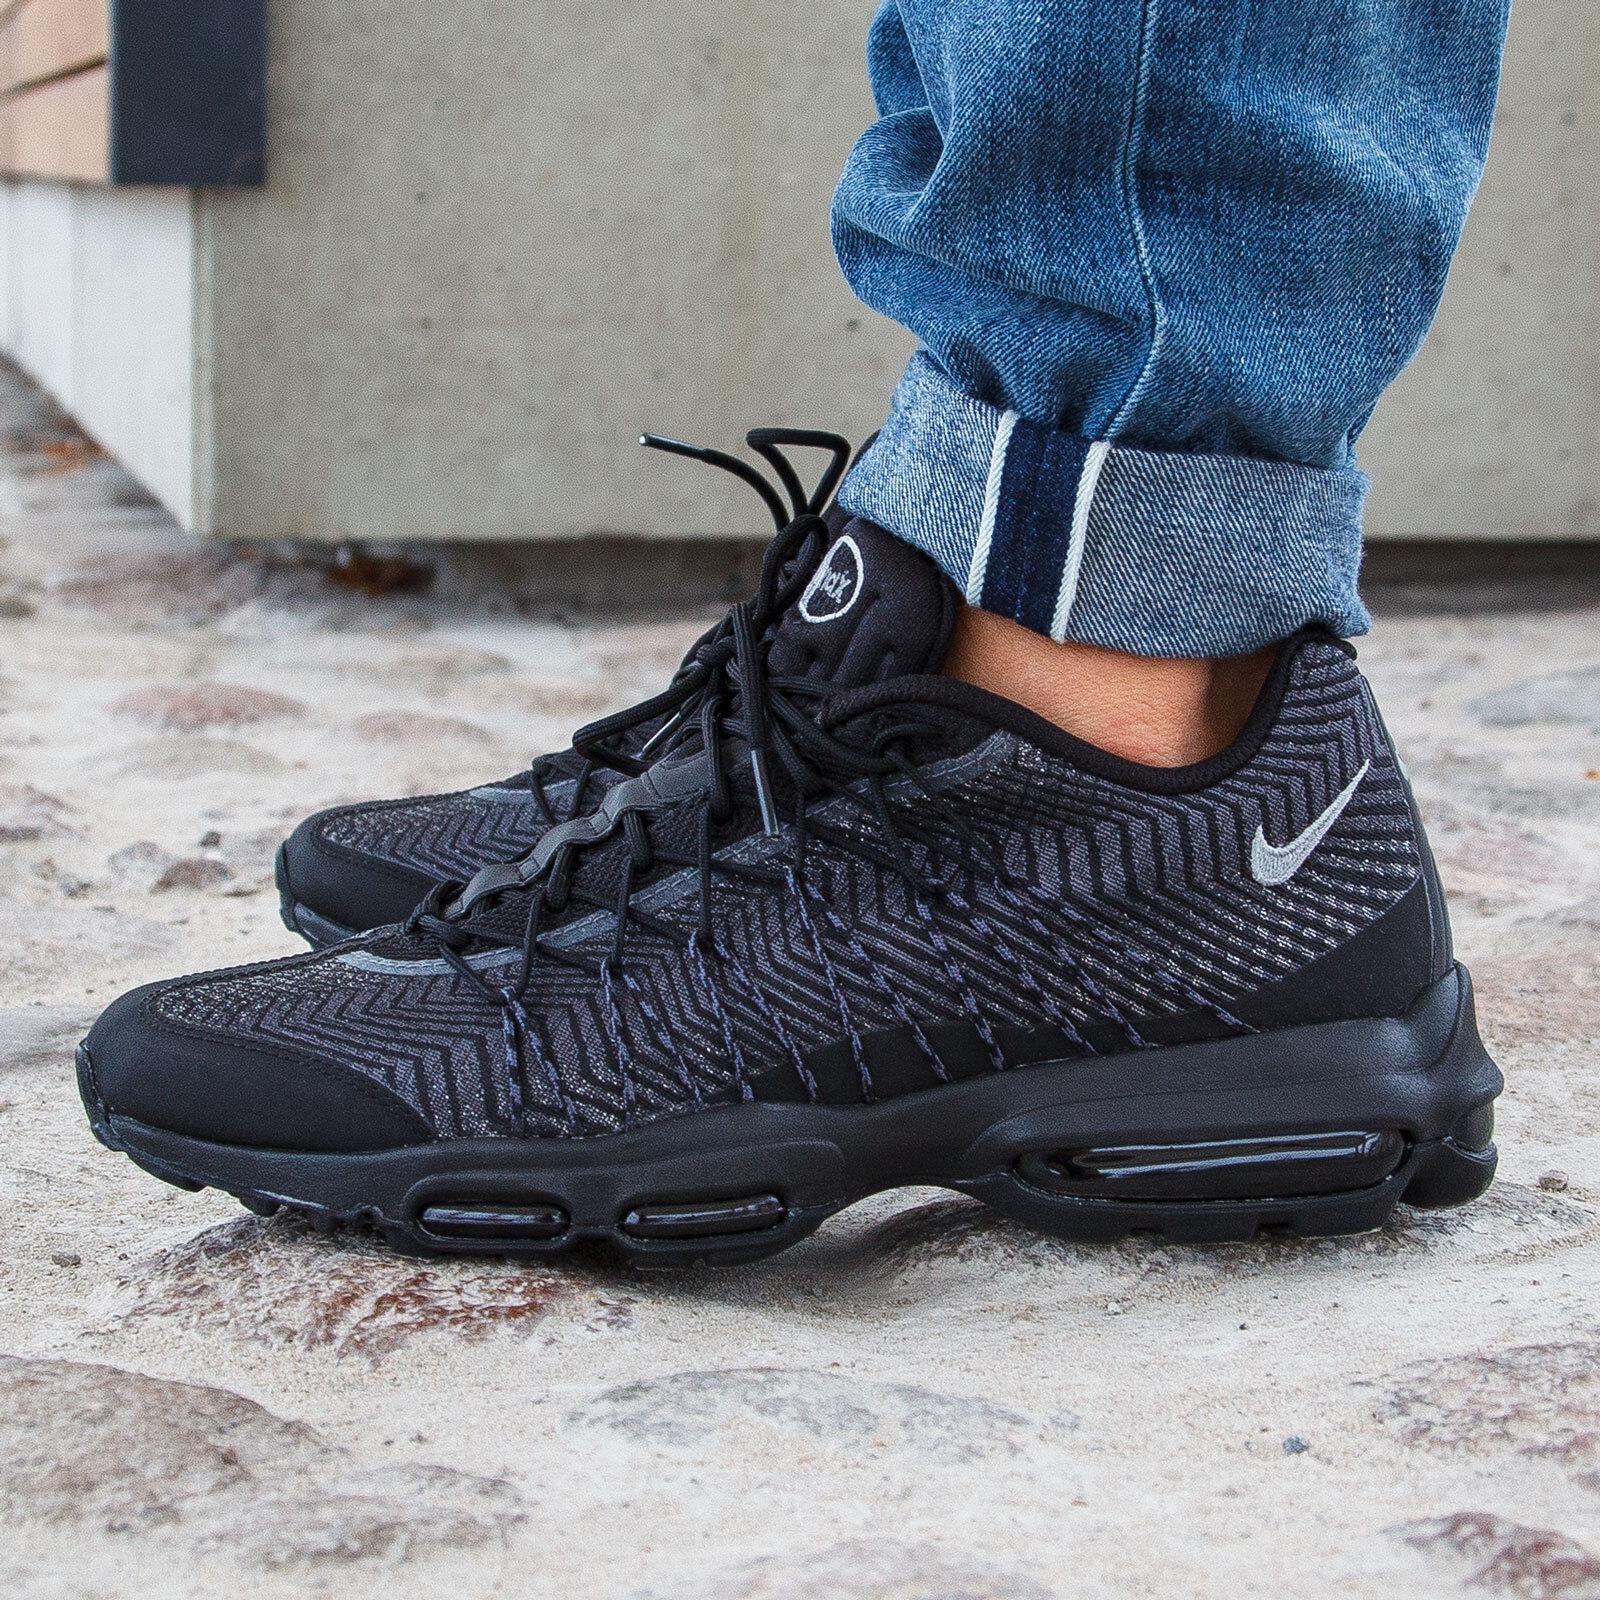 Nike air max scarpe 95 ultra jcrd Uomo scarpe max sz 9 749771-001 nero / argento / grigio scuro a3af81